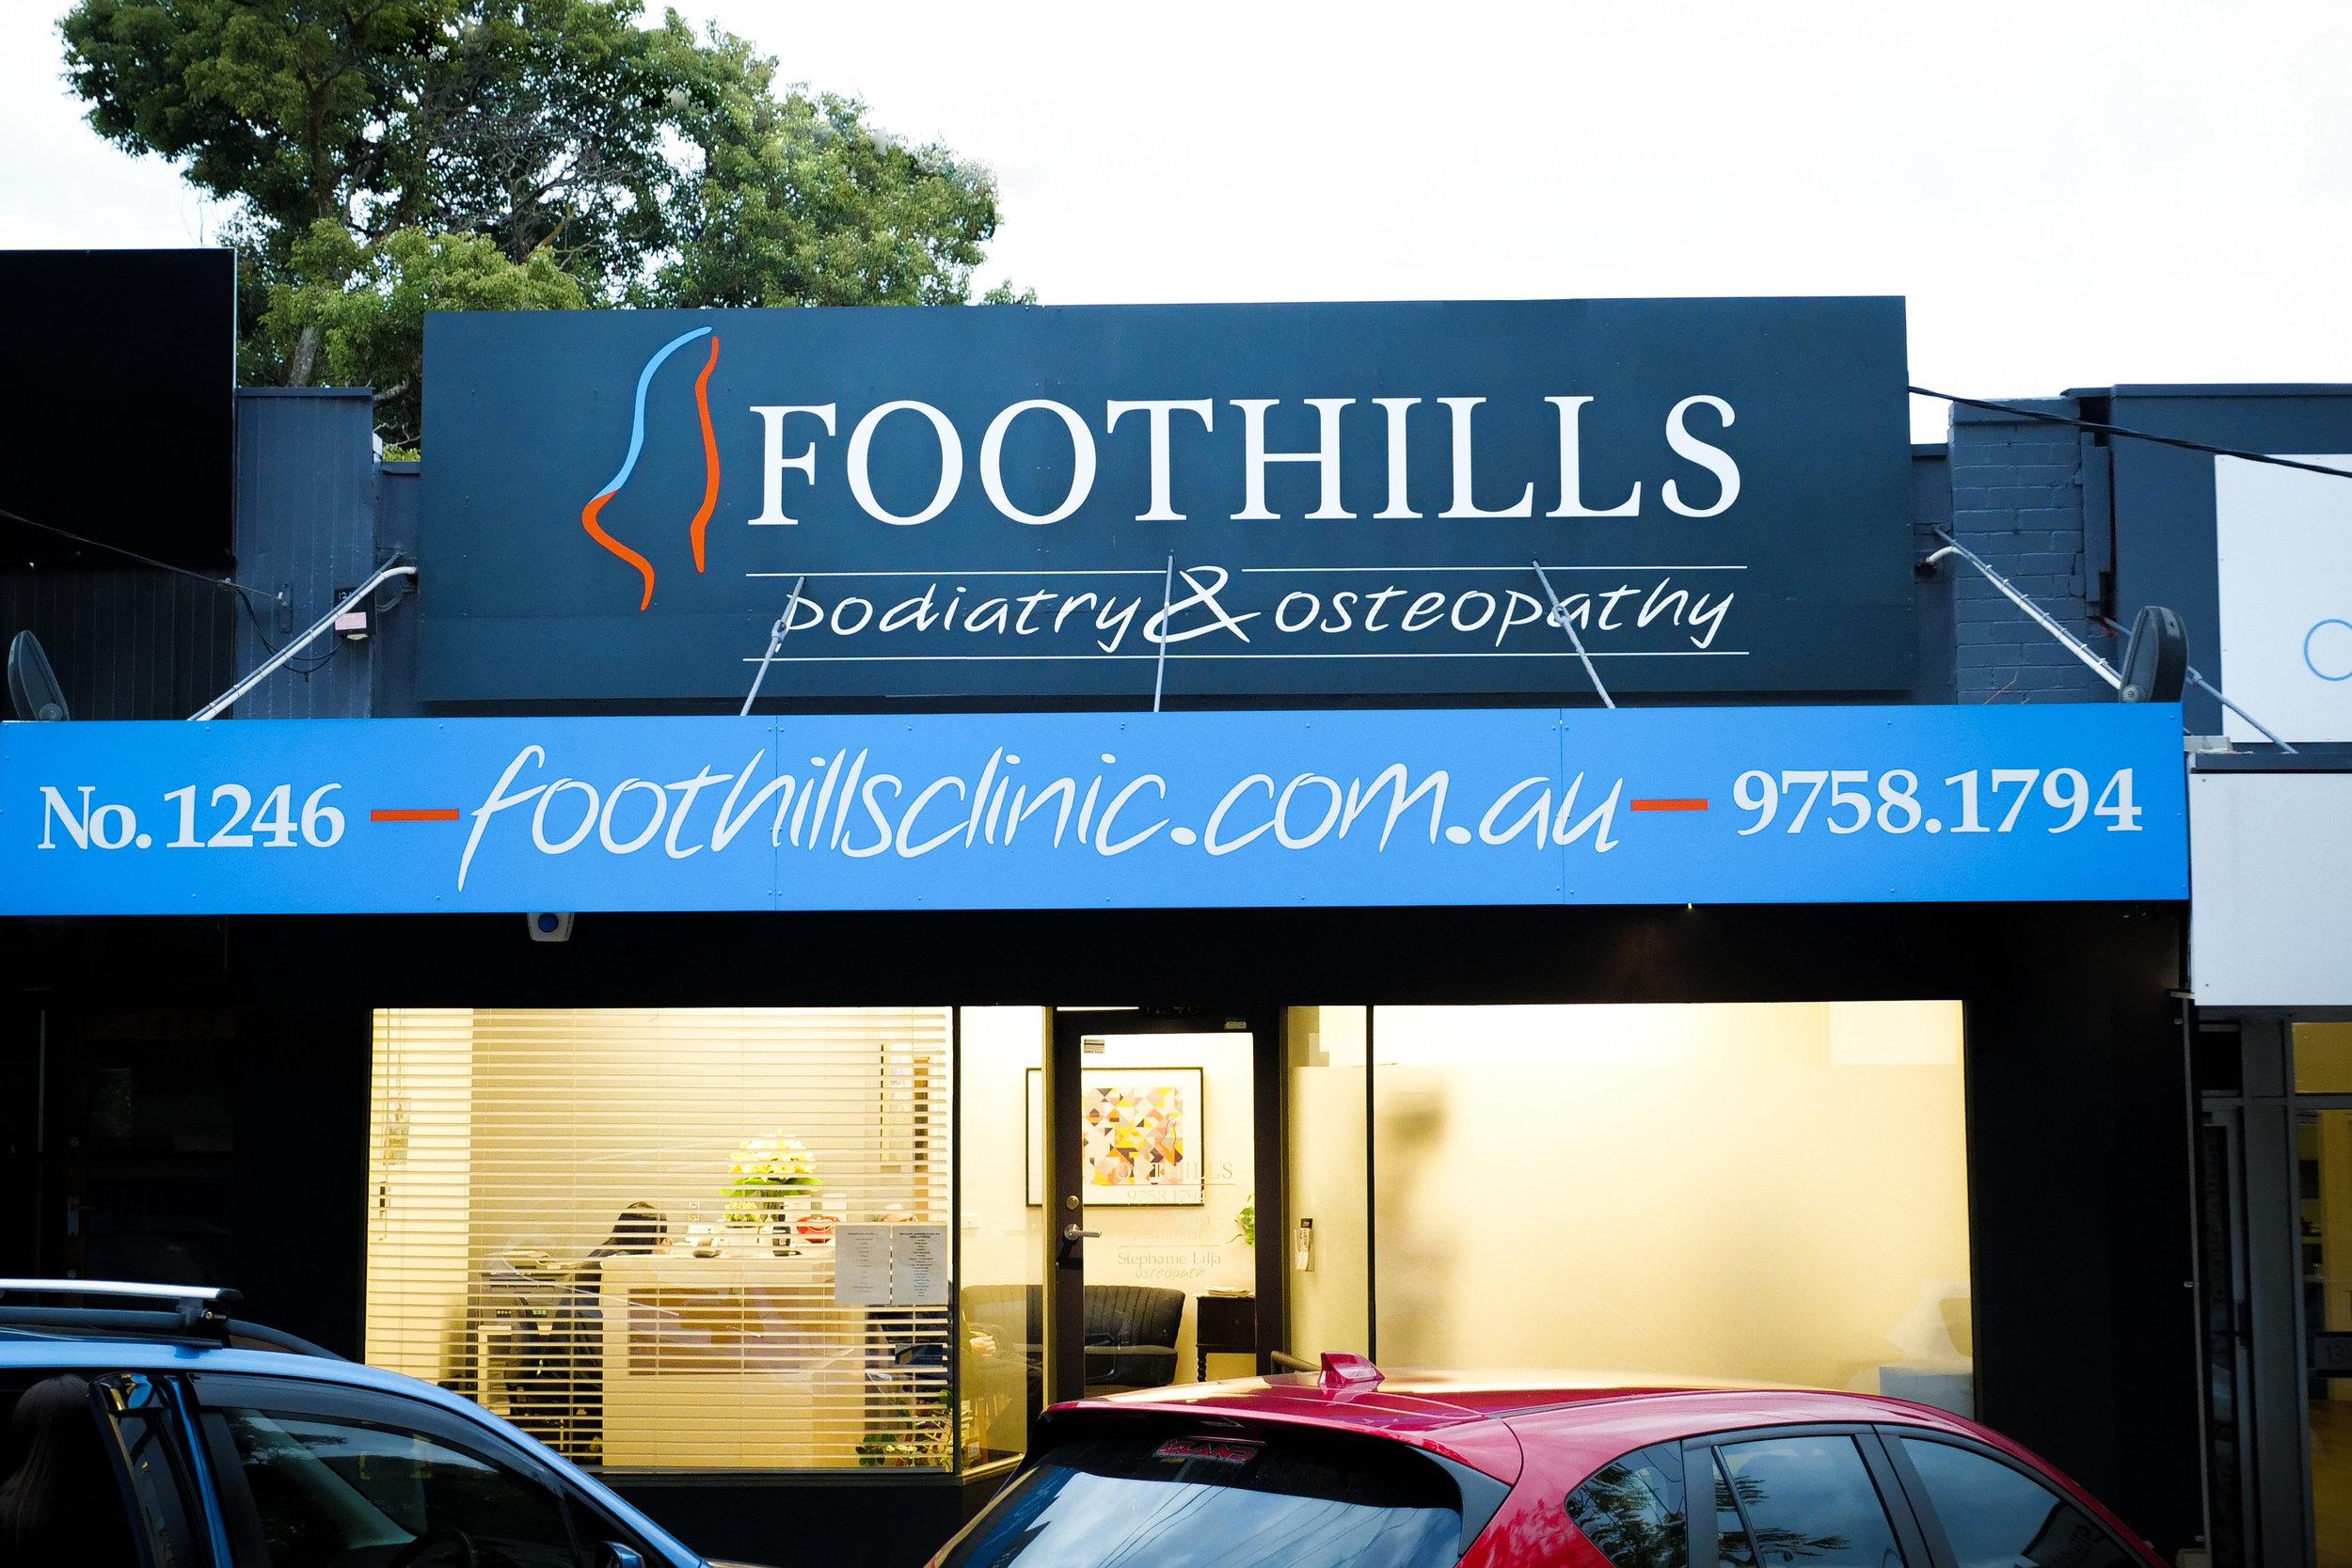 Foothills Upper Ferntree Gully